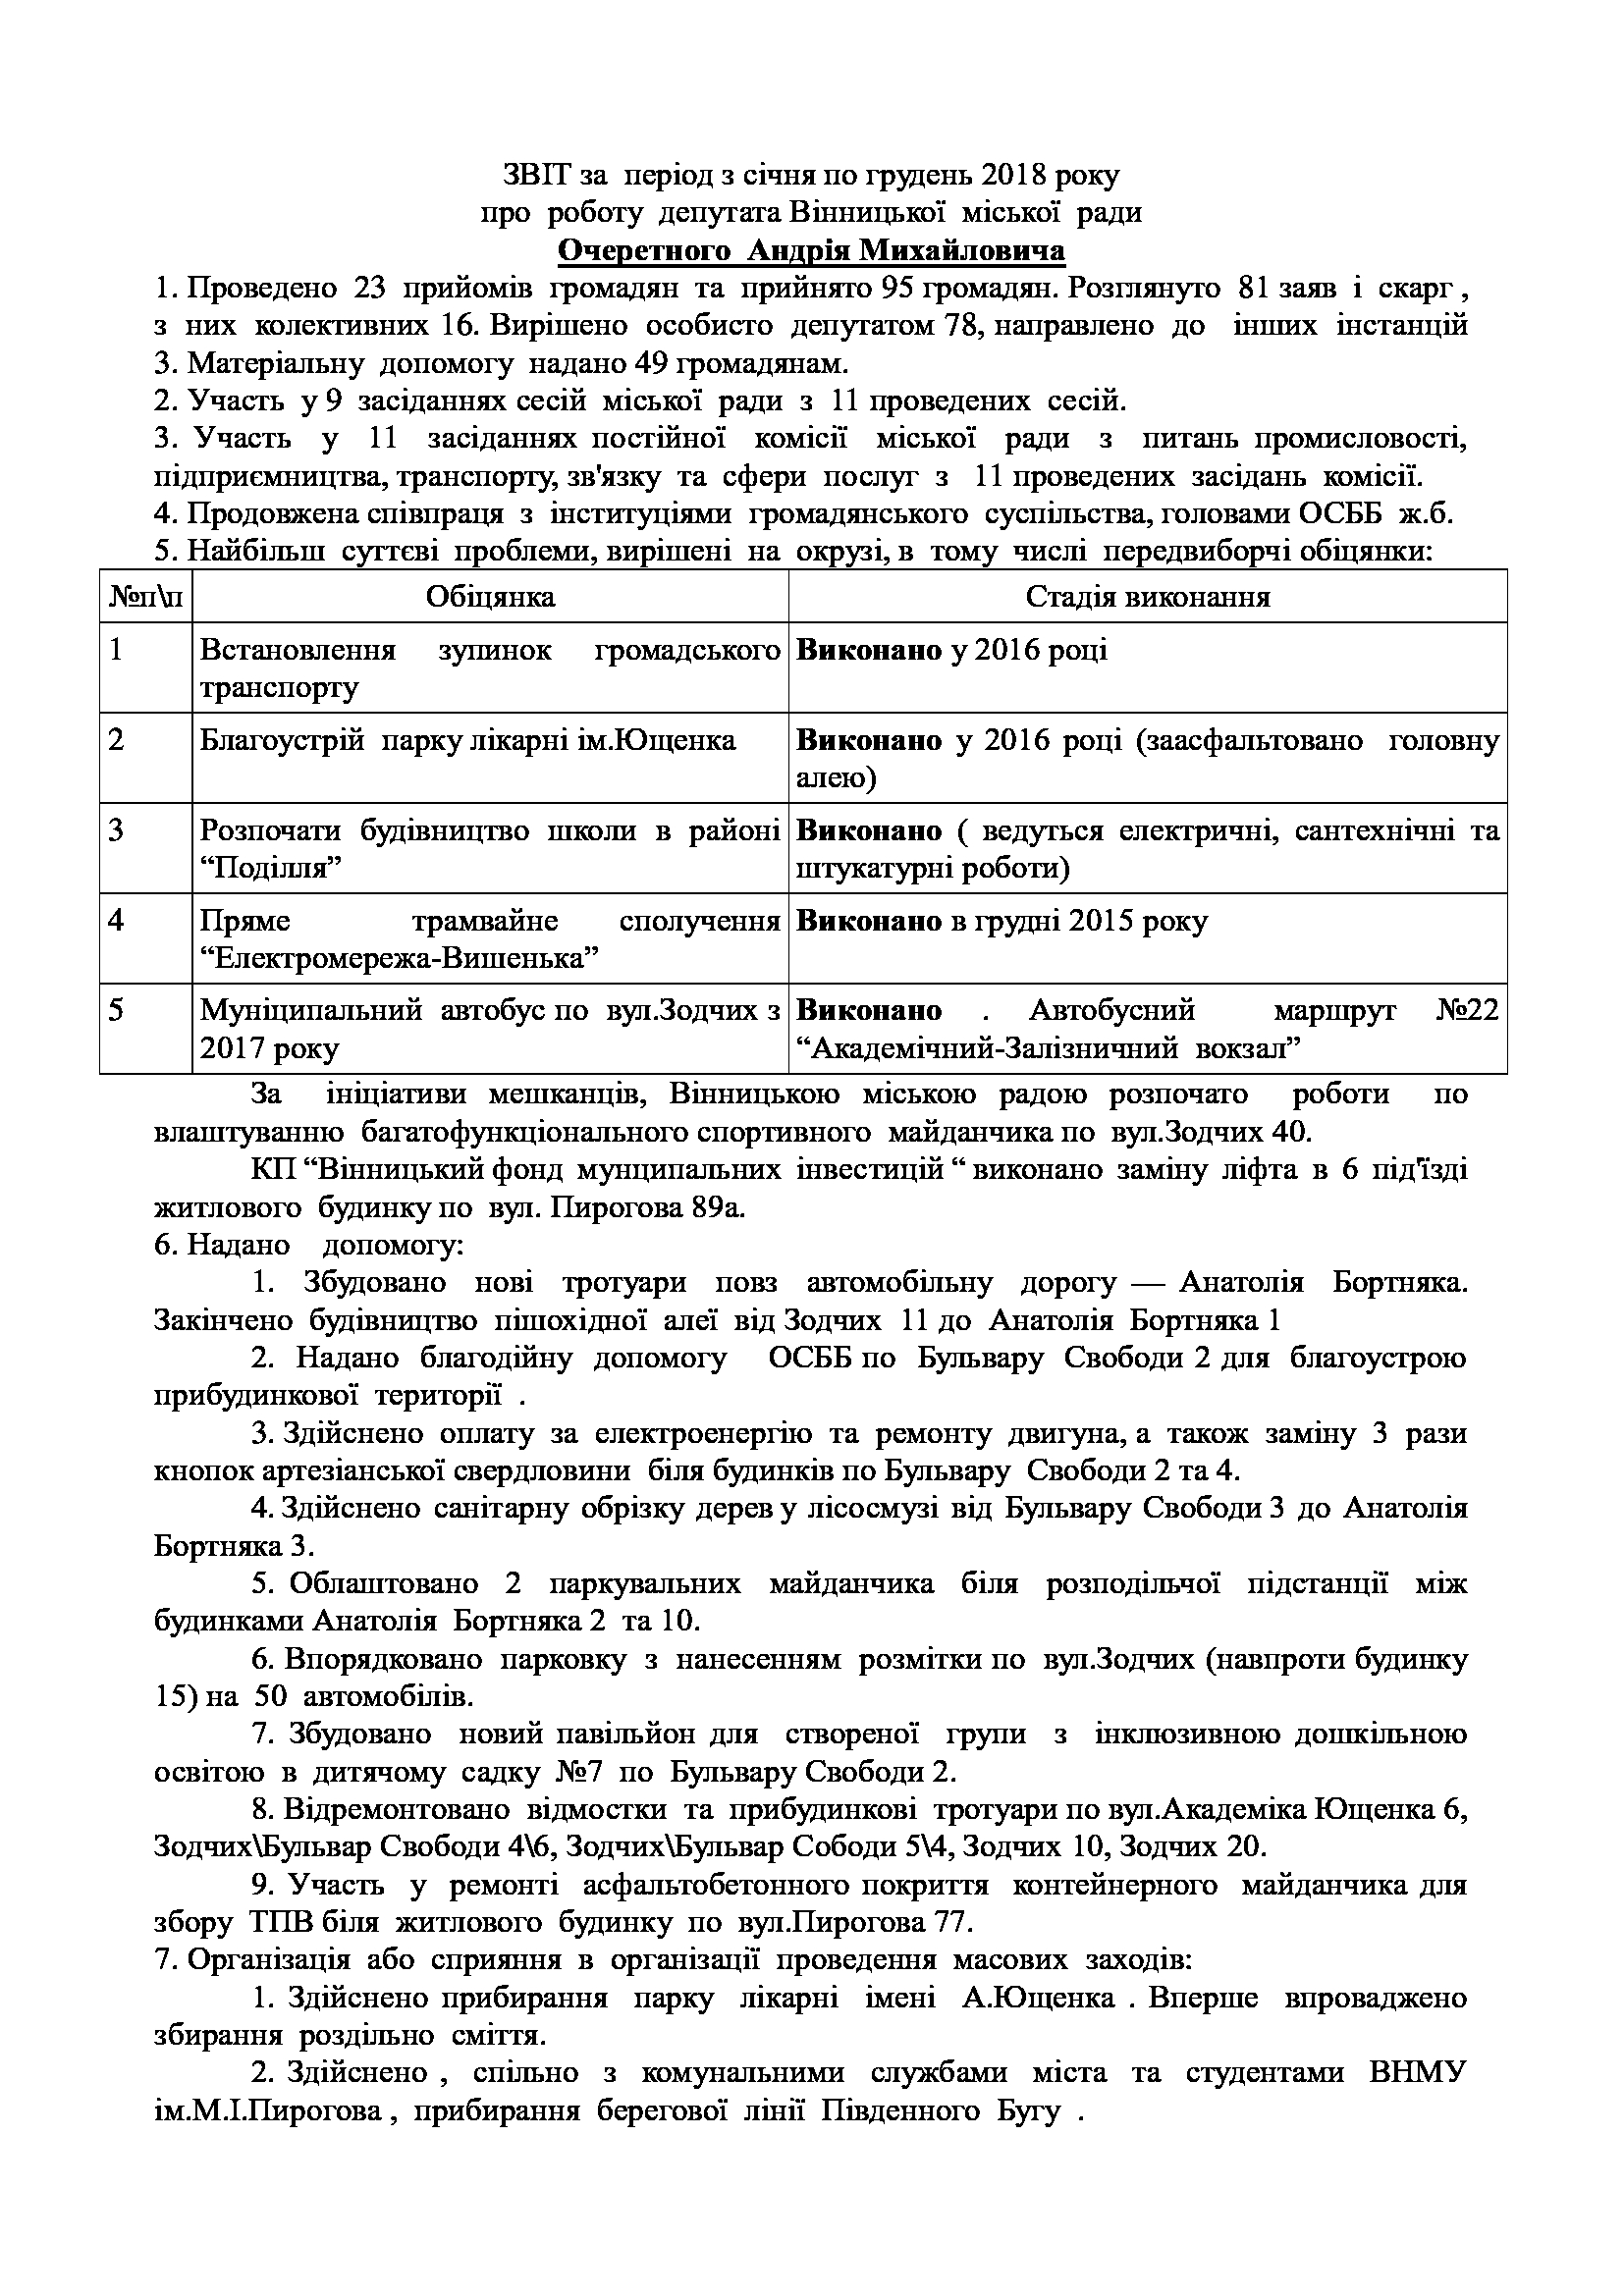 Звiт про роботу депутата ВМР А.М.Очеретного